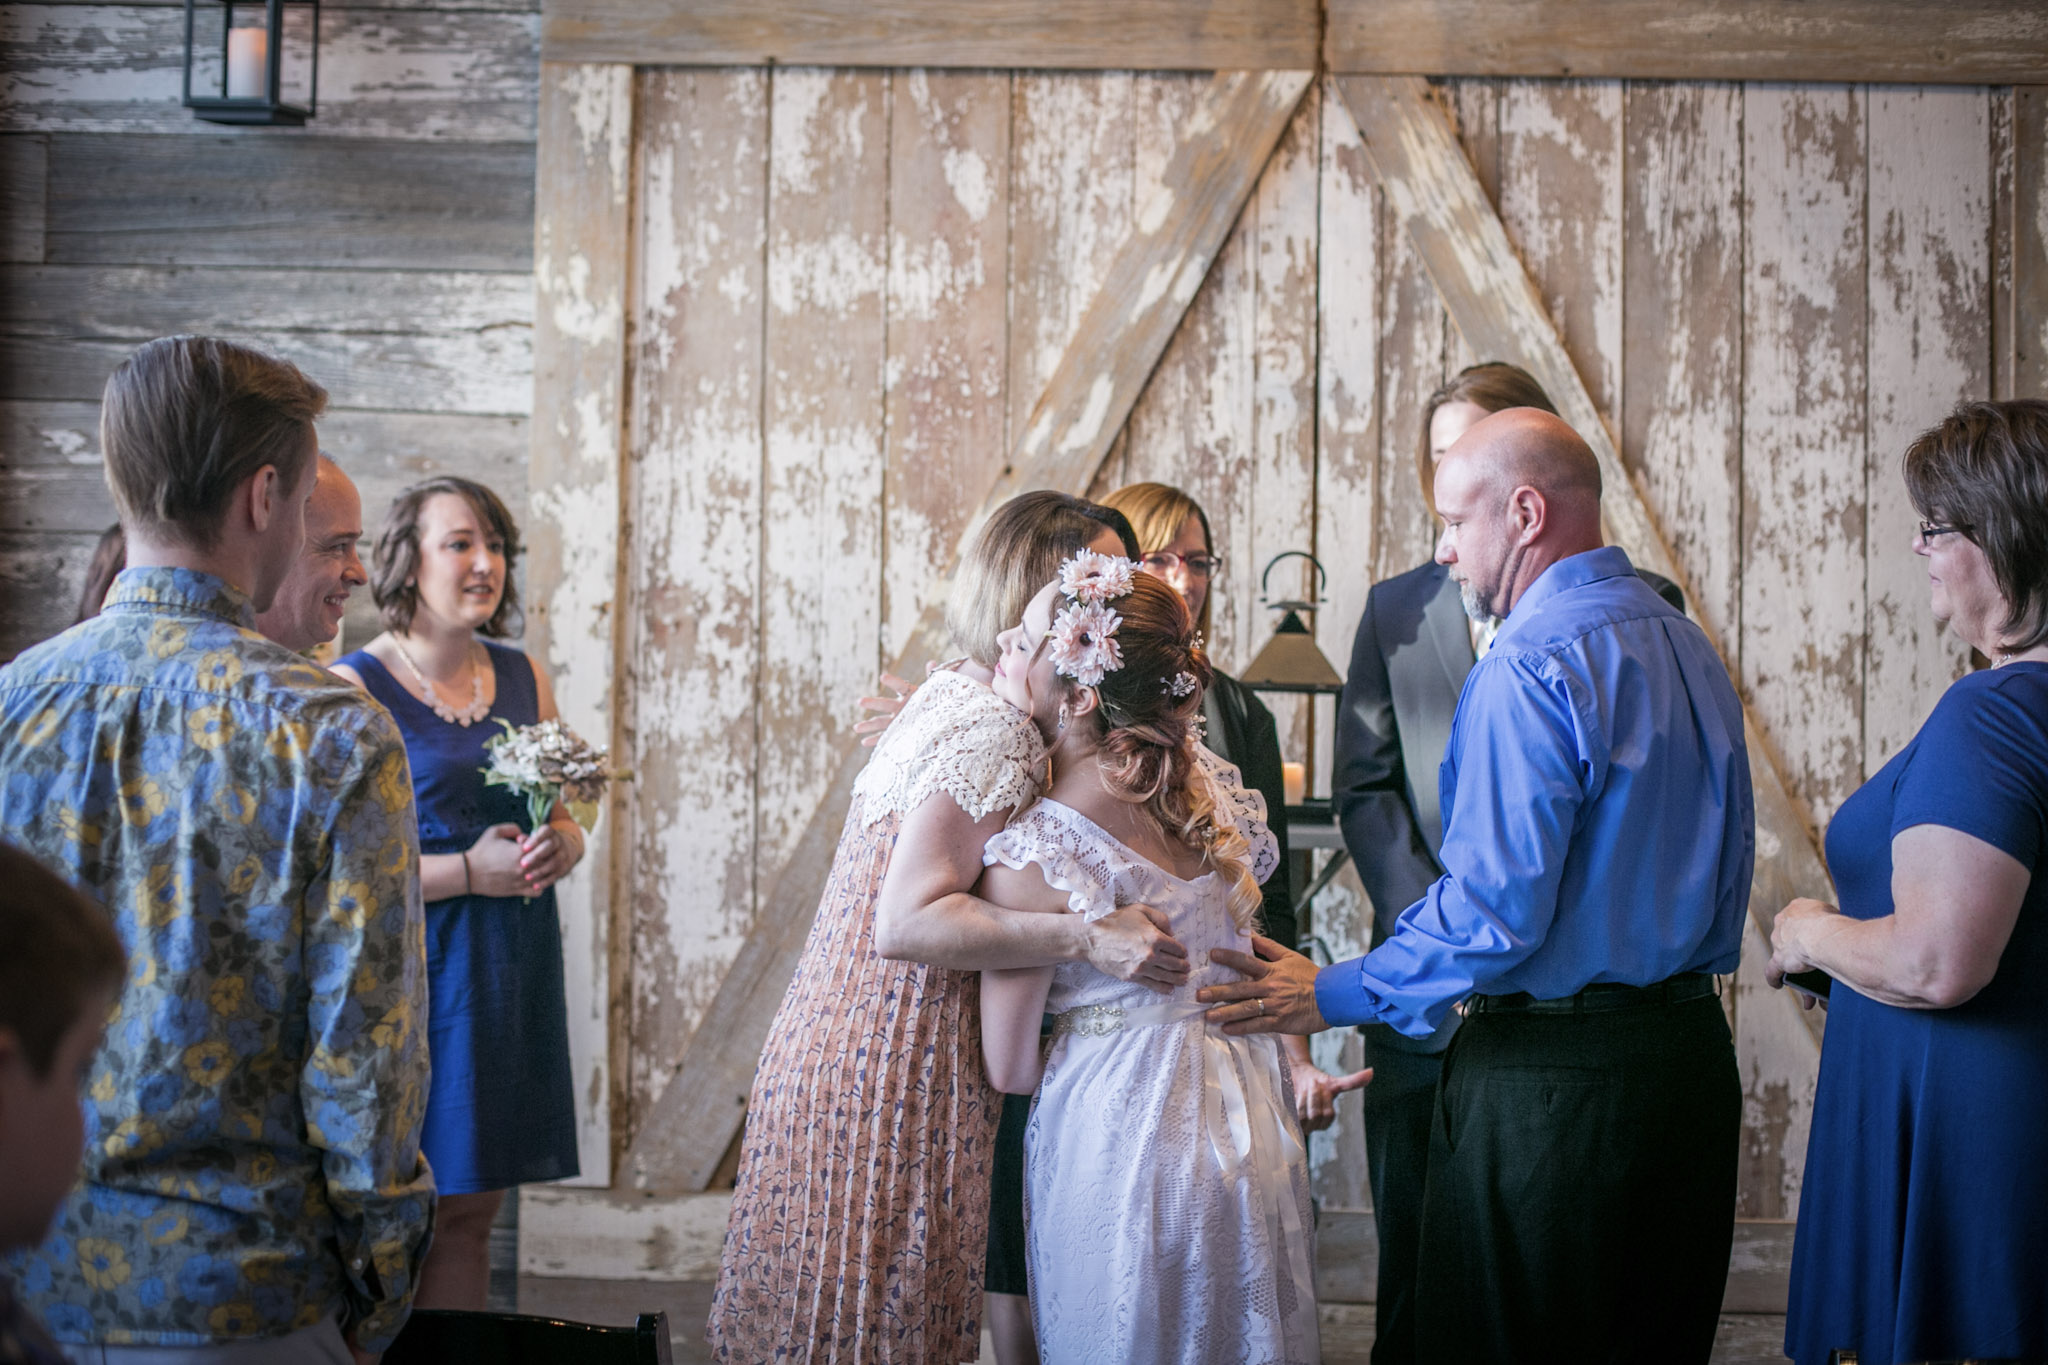 Kansas_City_Small_Wedding_Venue_Elope_Intimate_Ceremony_Budget_Affordable_Sophie&Philip_089.jpg